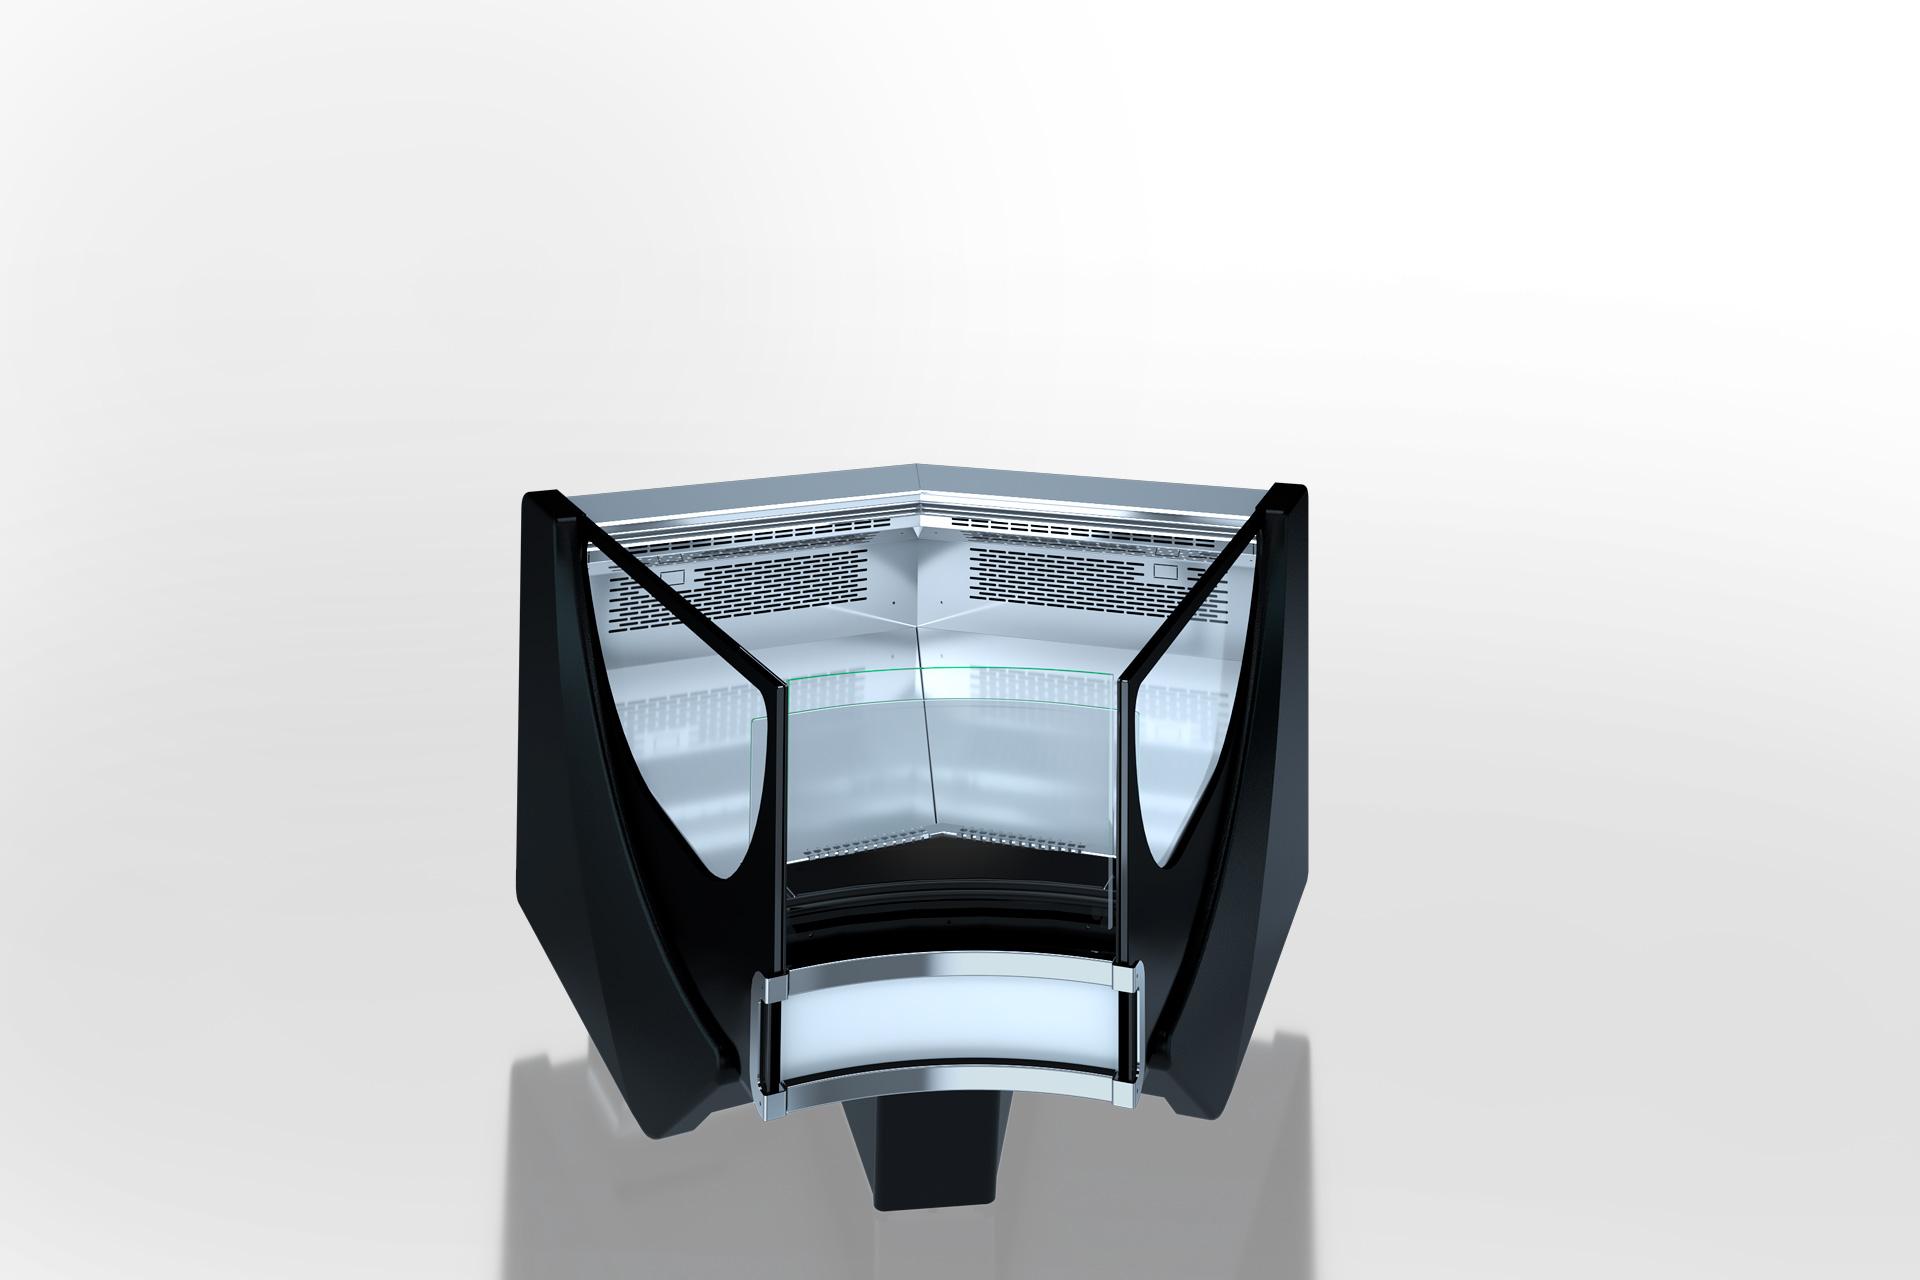 Angular element Missouri cold diamond MC 126 deli self 084-DLM-IR45